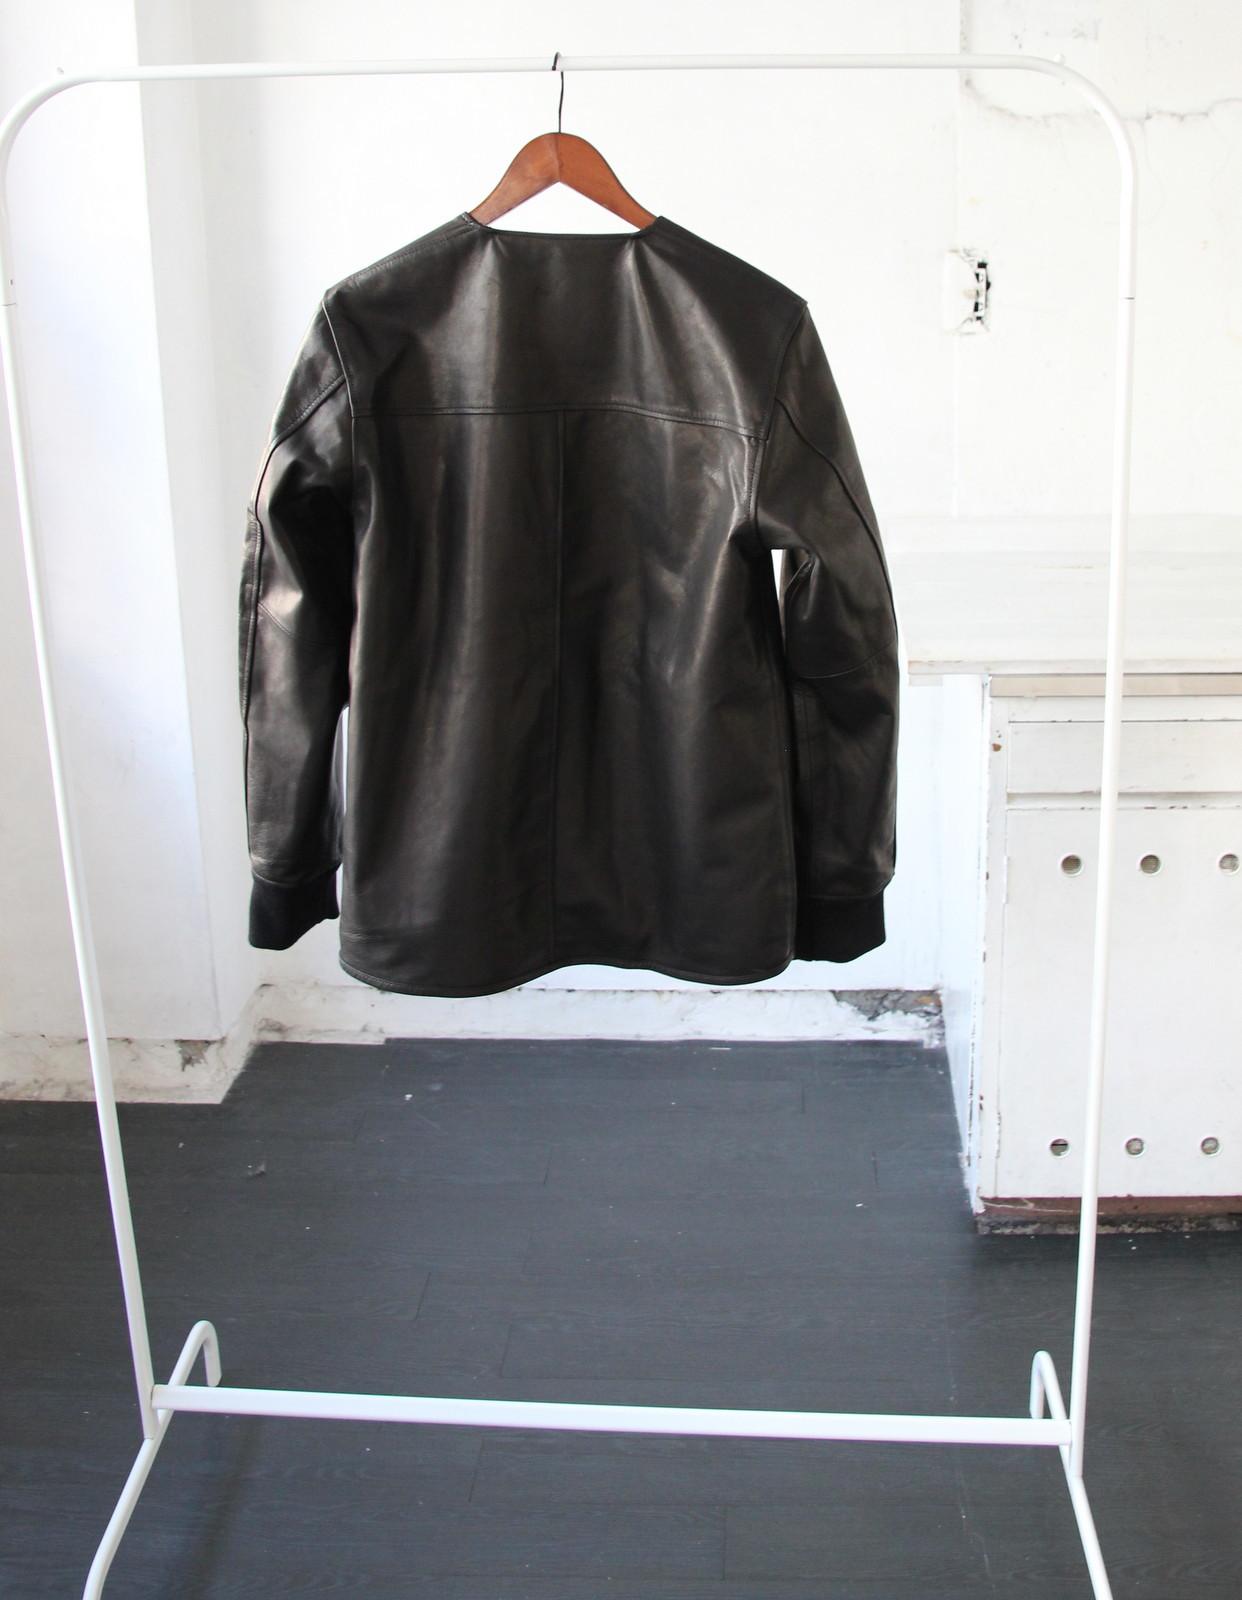 Japan Horse Leather Blouson_c0379477_05595124.jpg